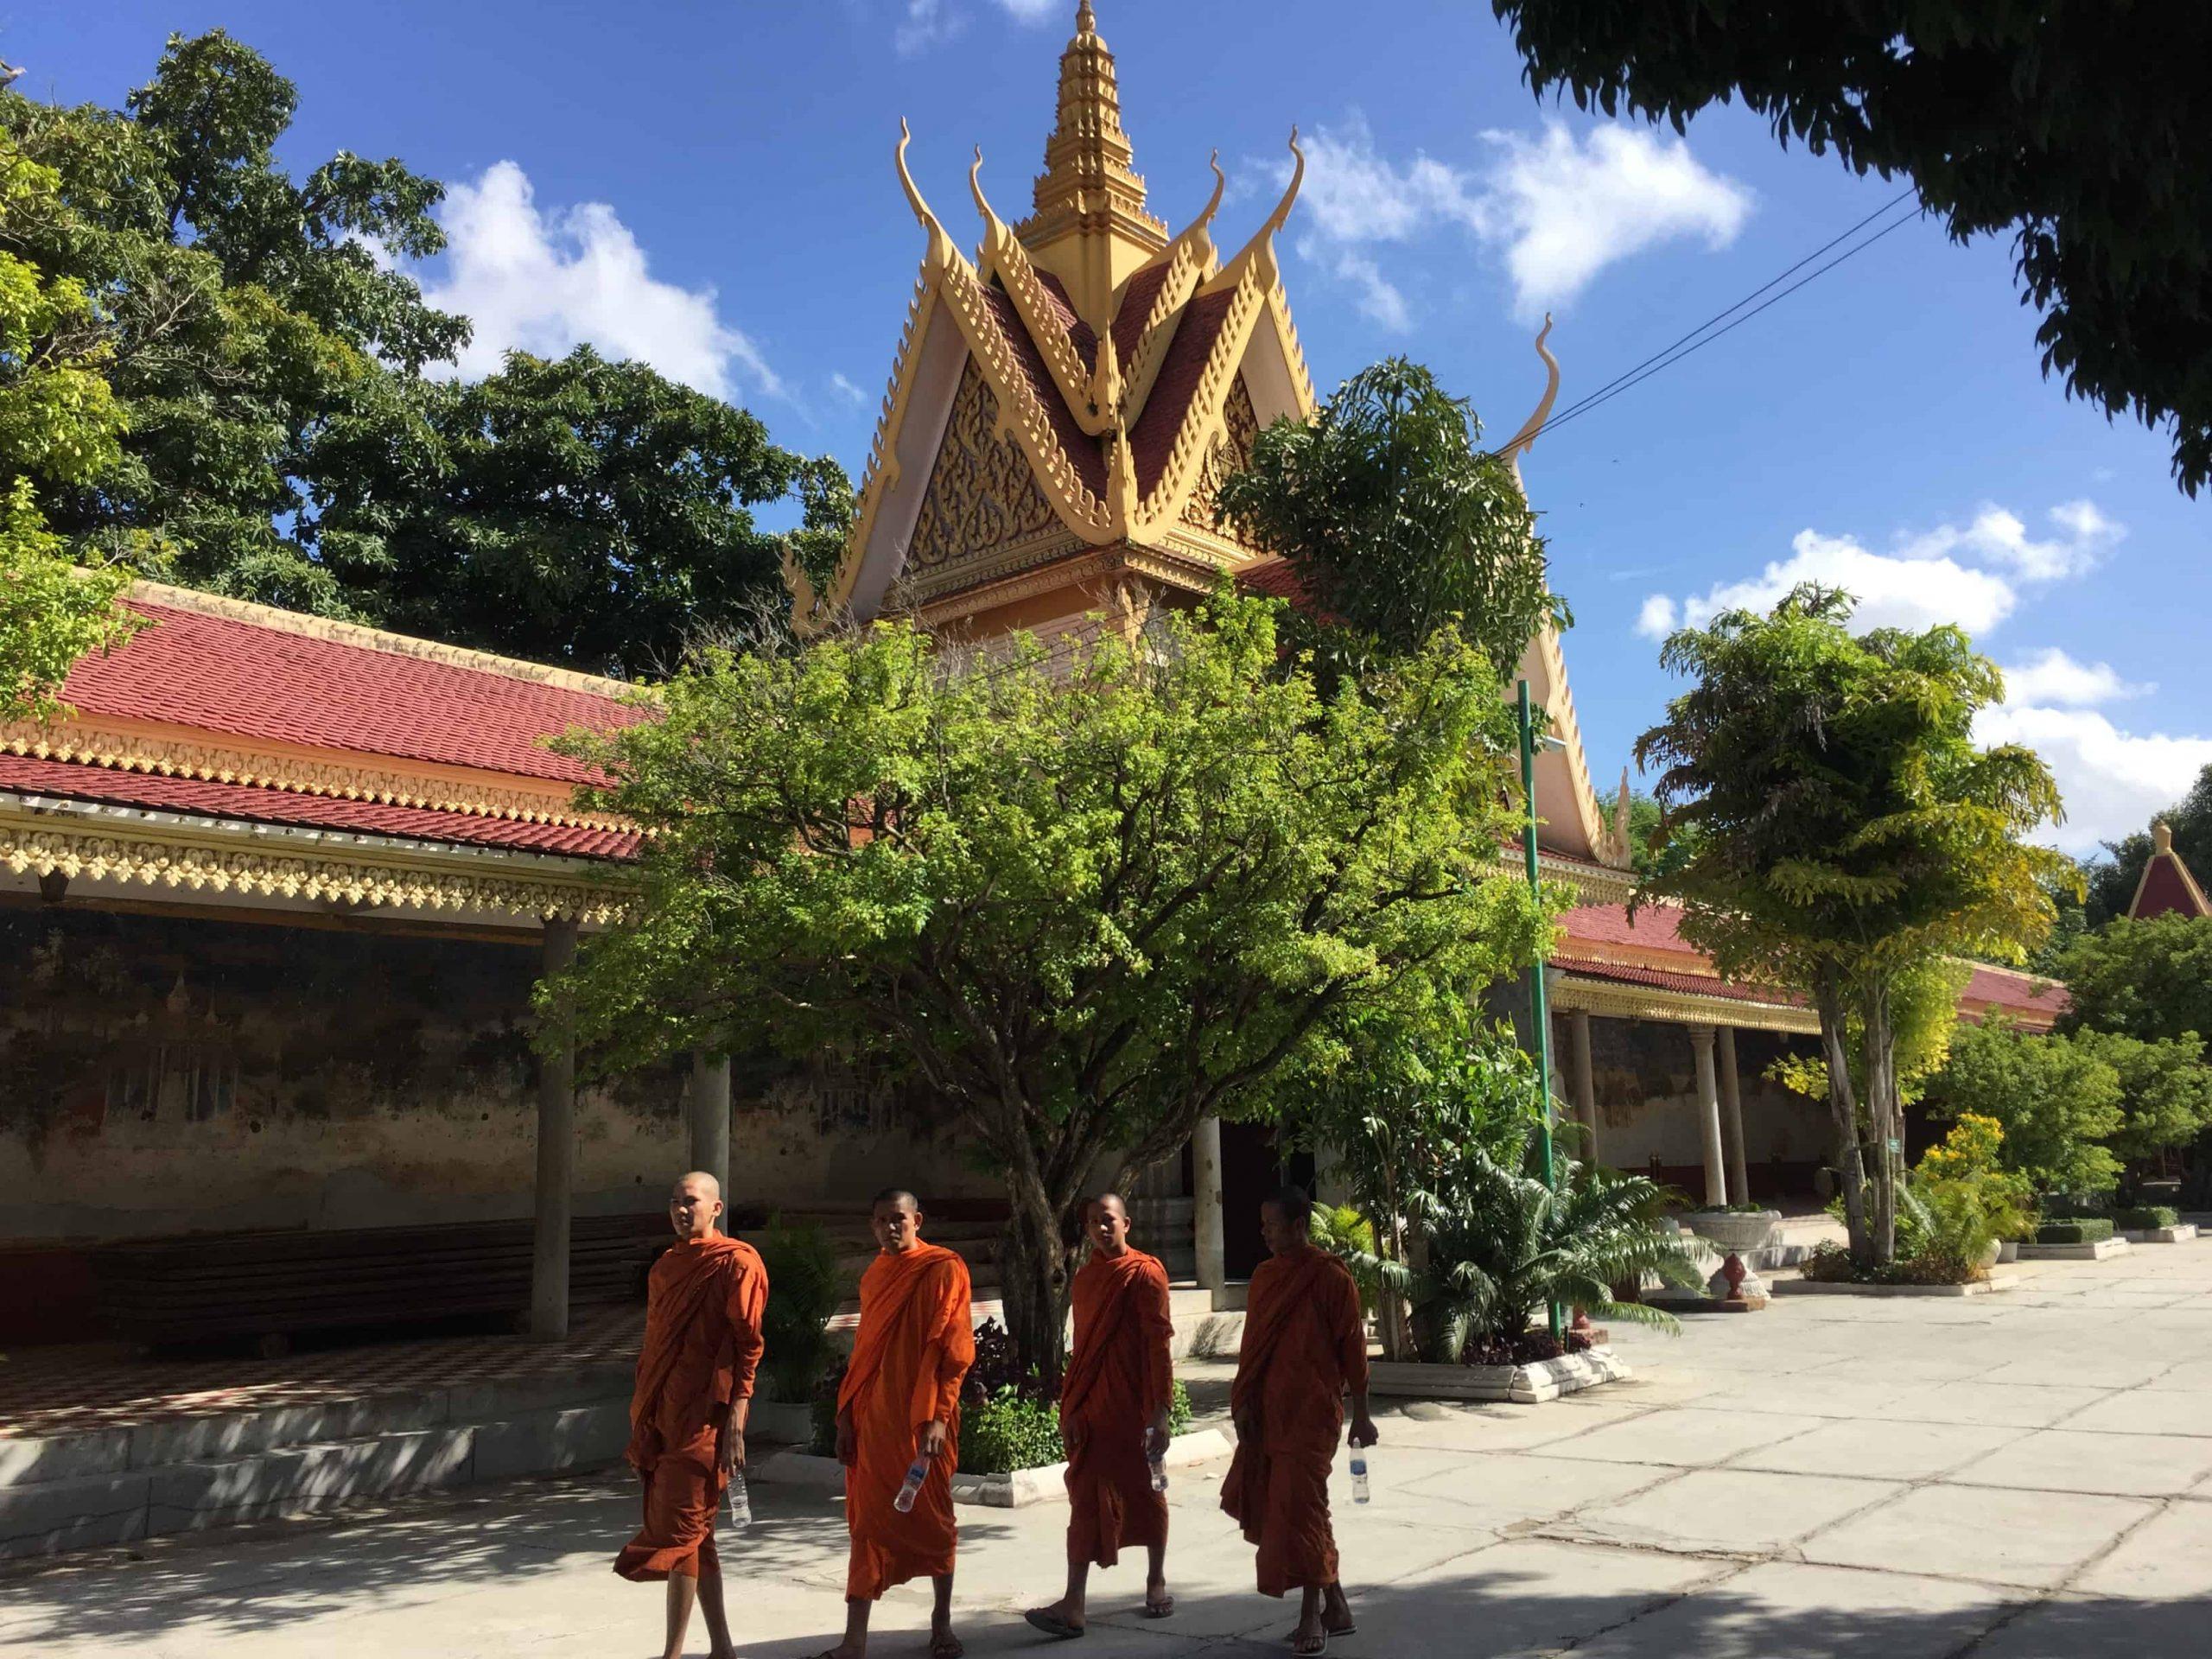 Royal Palace in Phnom Penh